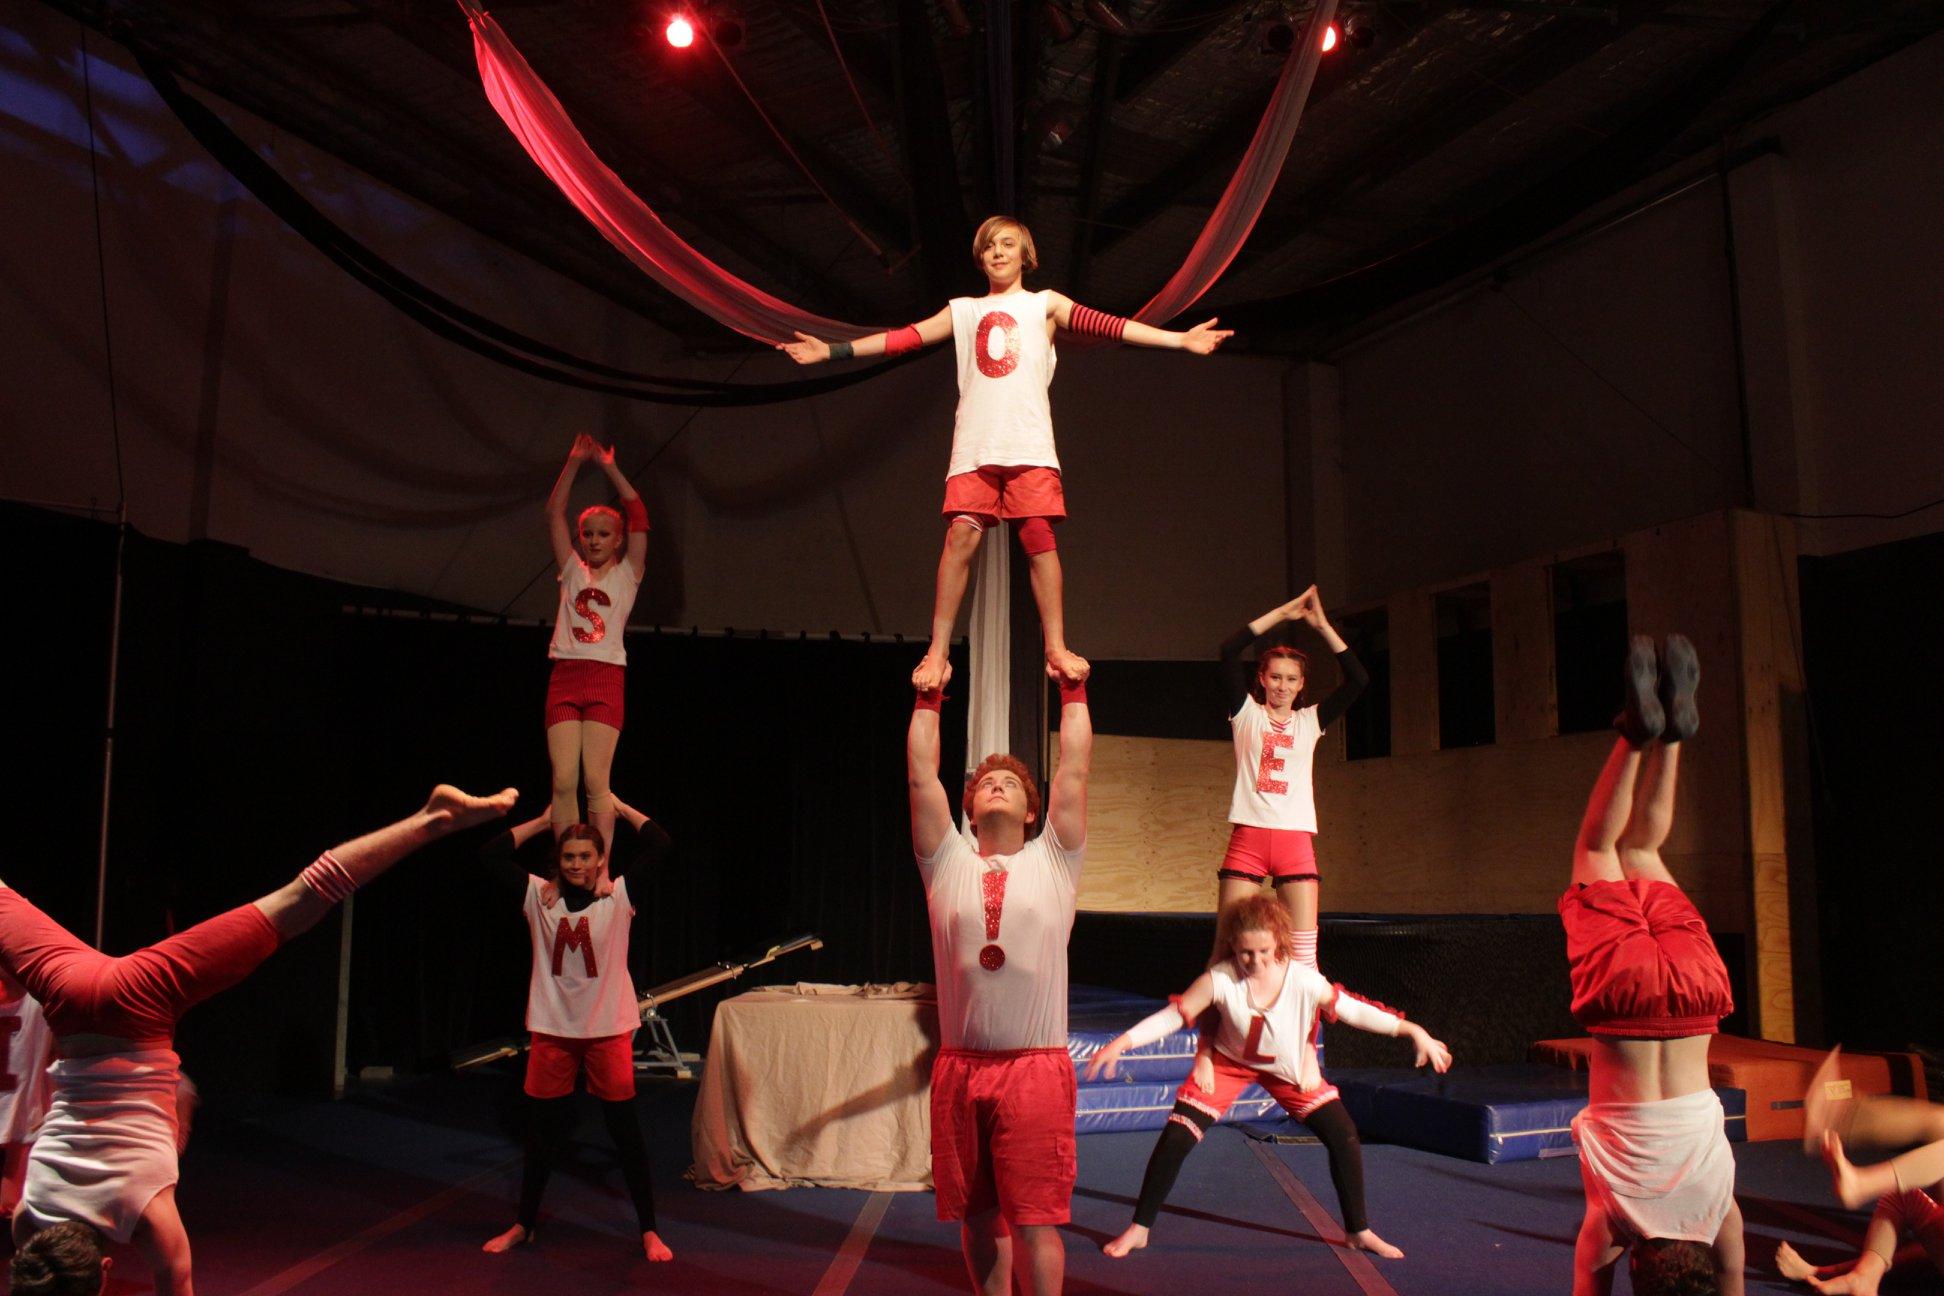 circus-arts-byron-bay-acro-circus-troupe-1